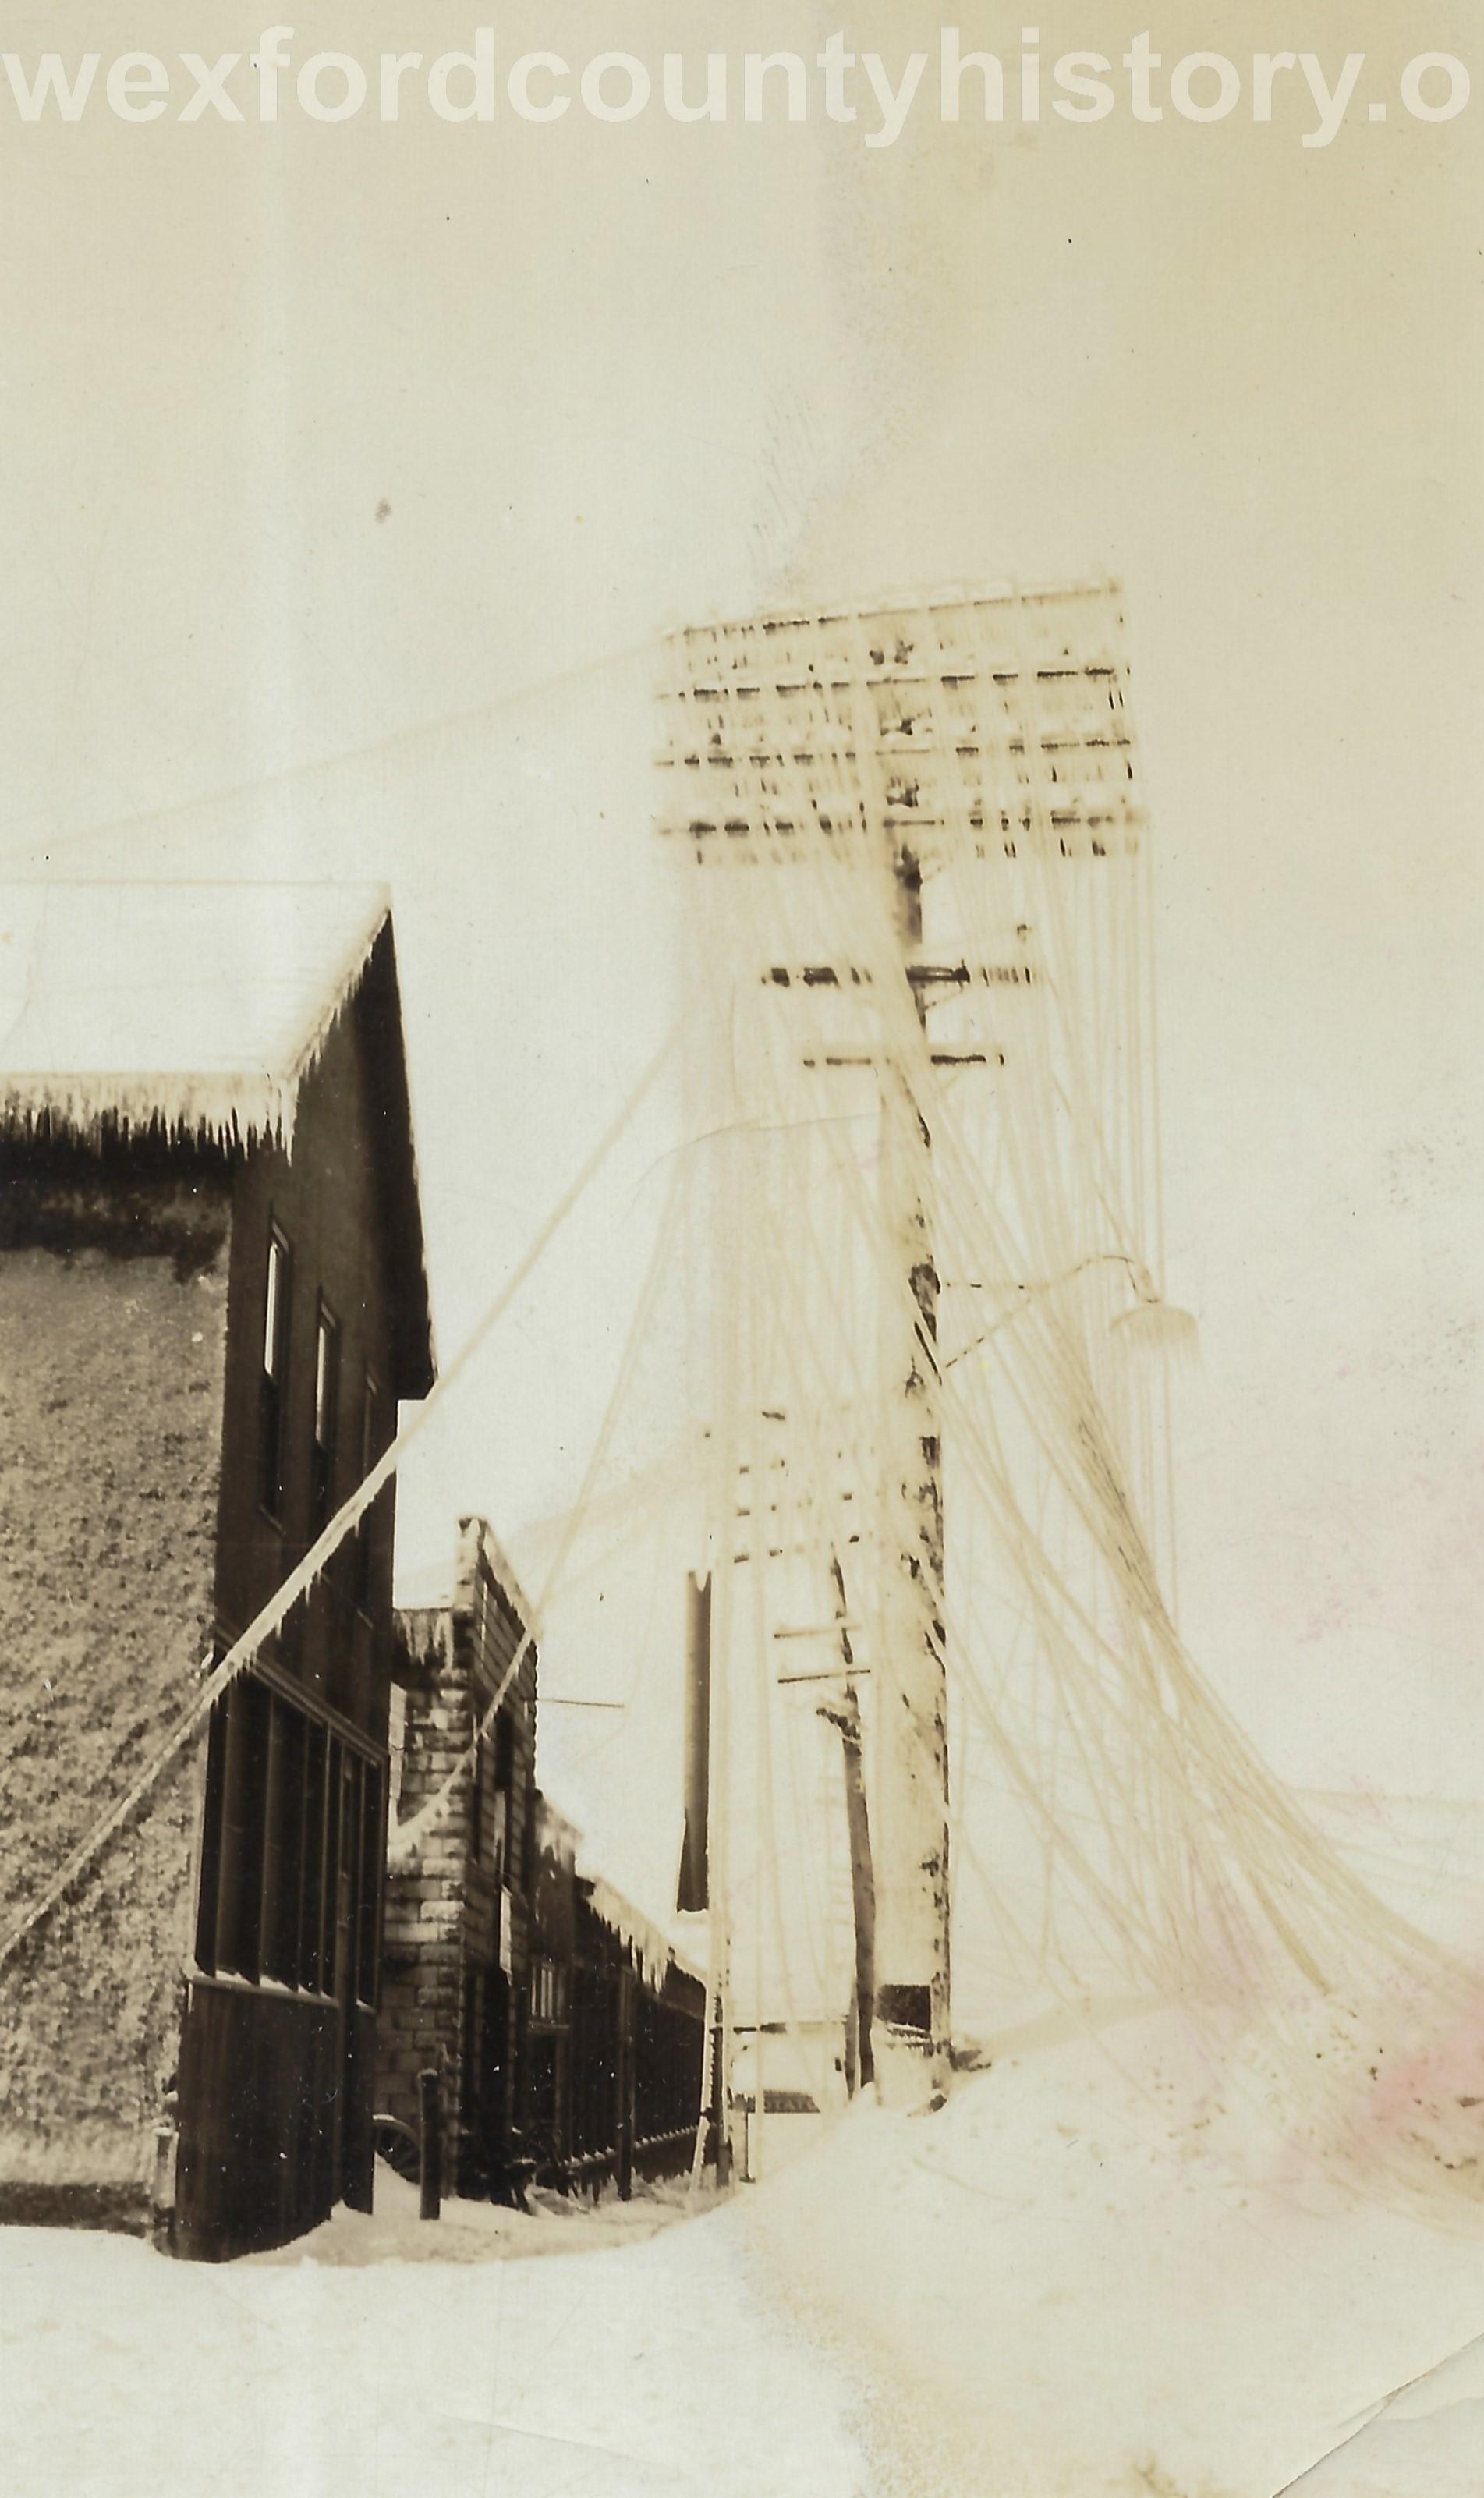 1922 Ice Storm - Power Wires